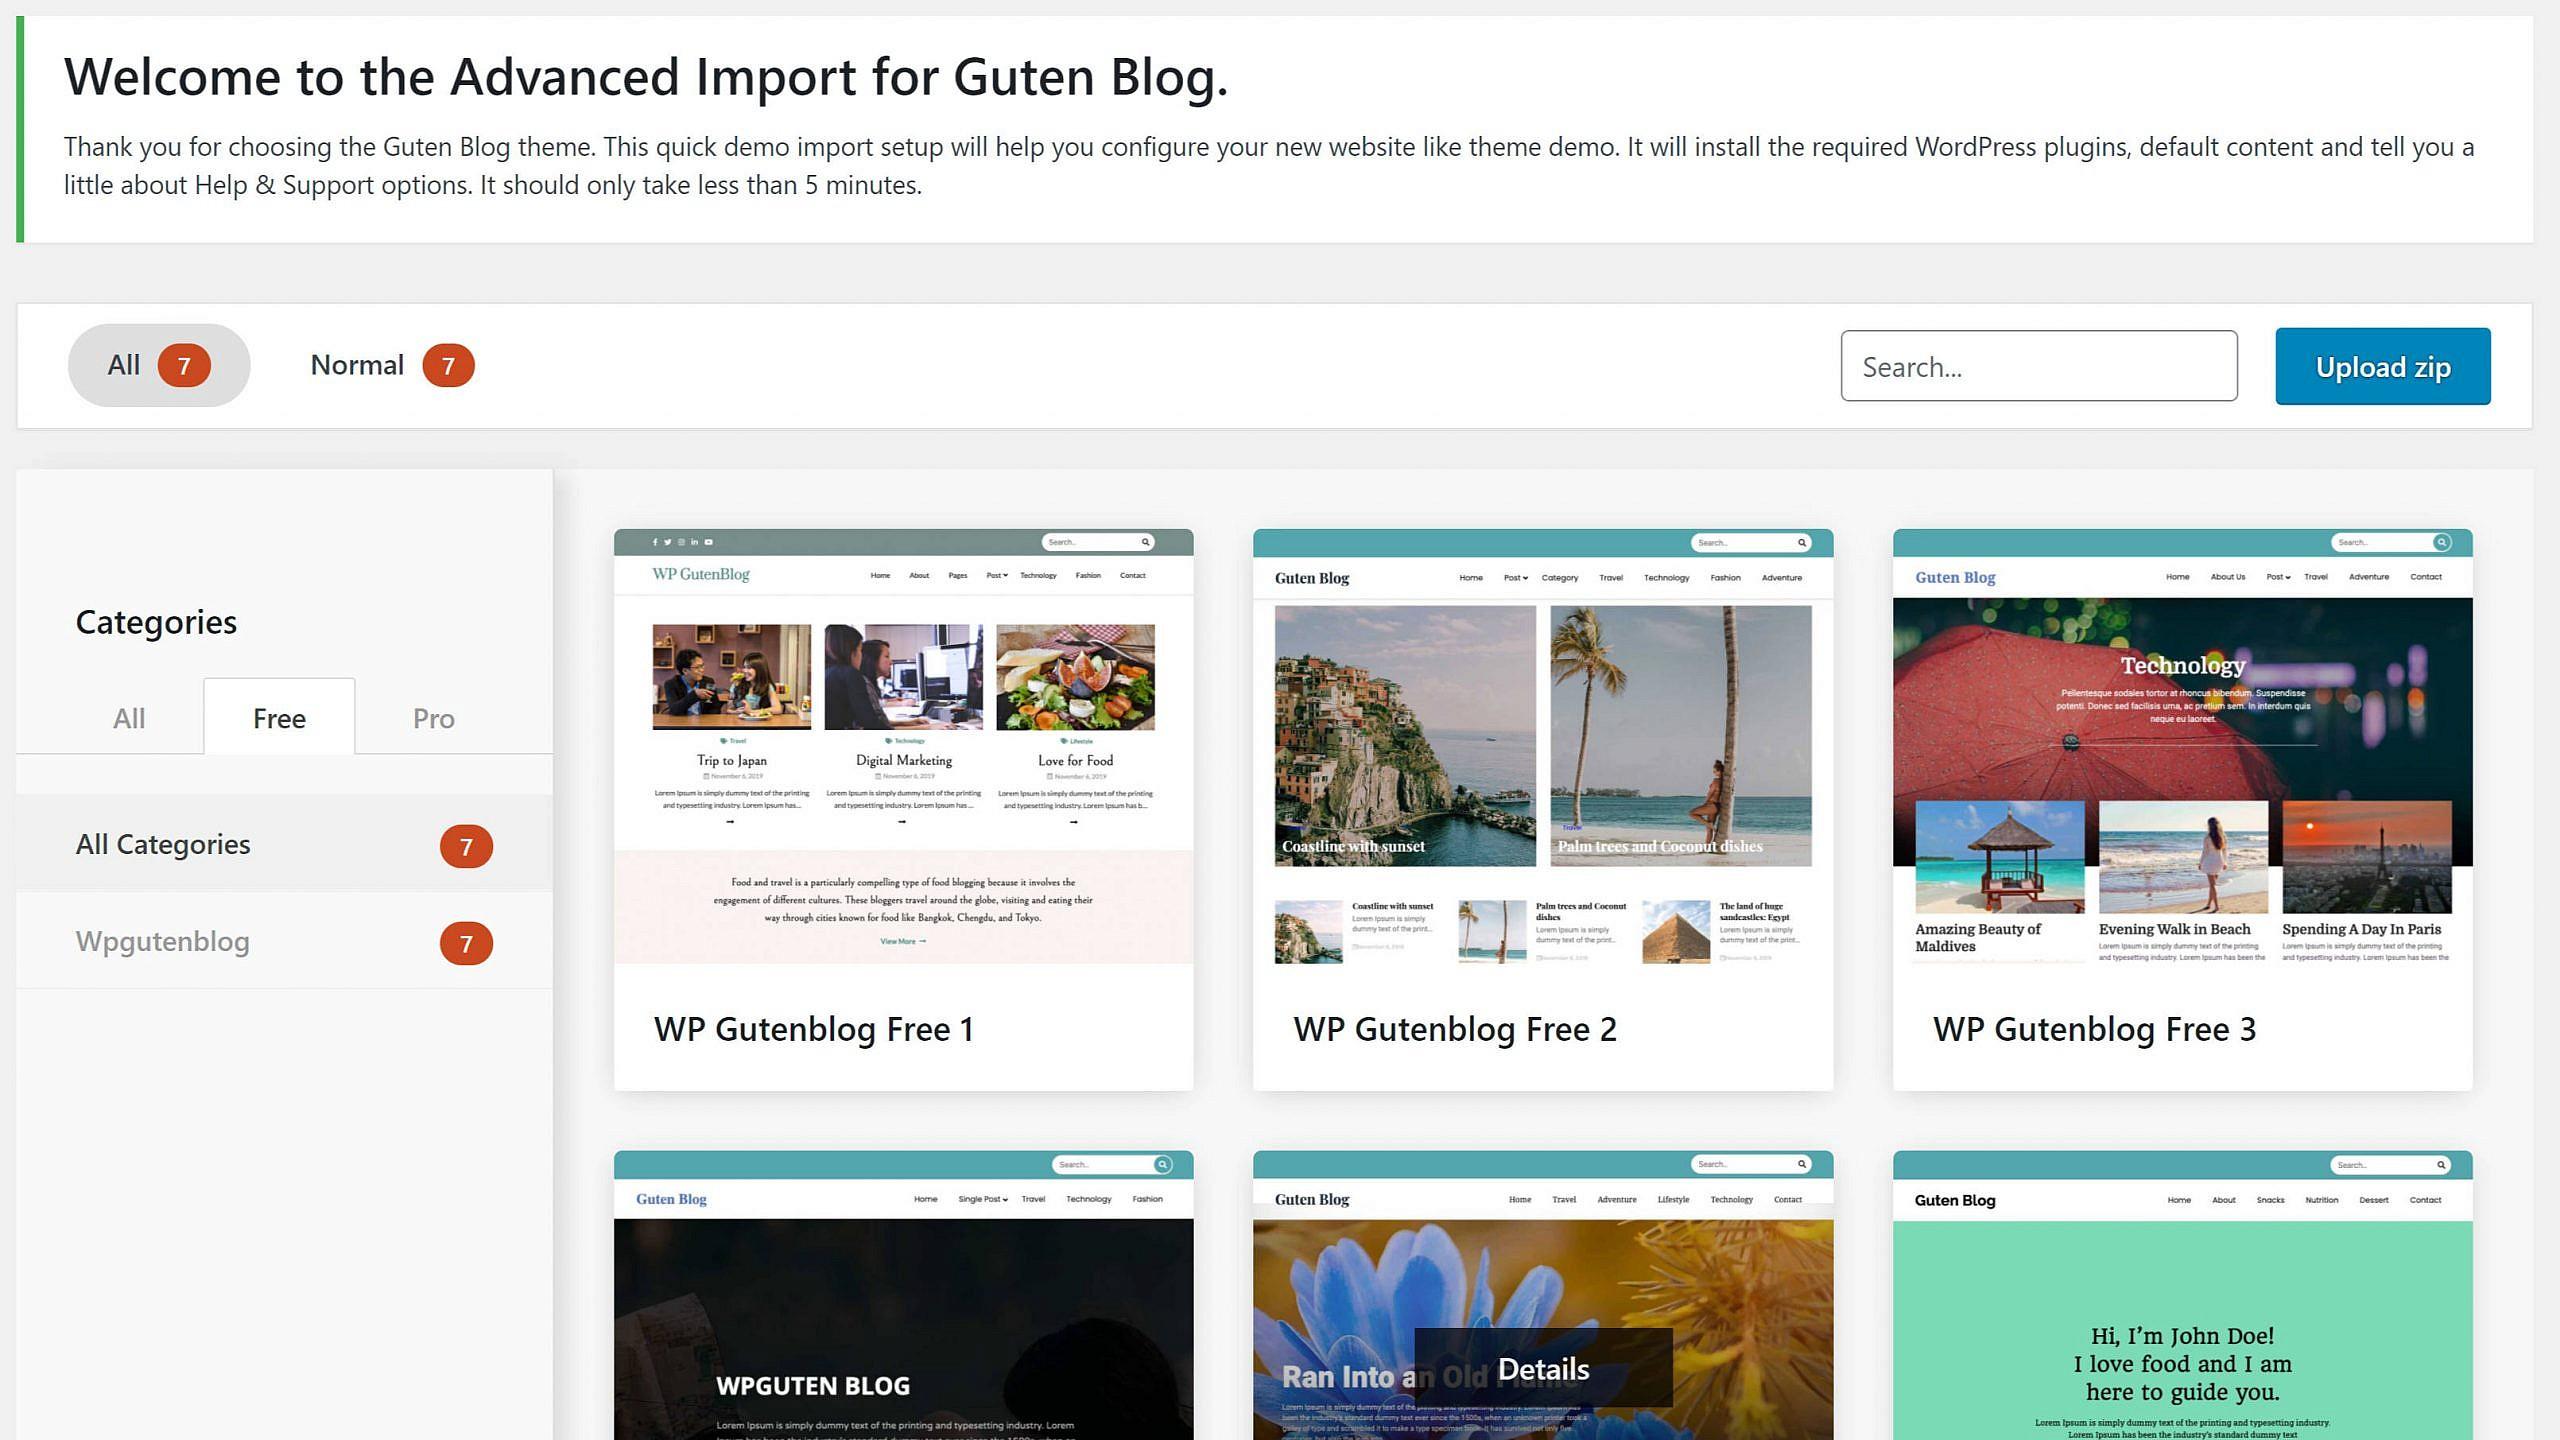 Demo import screen for the Guten Blog WordPress theme.